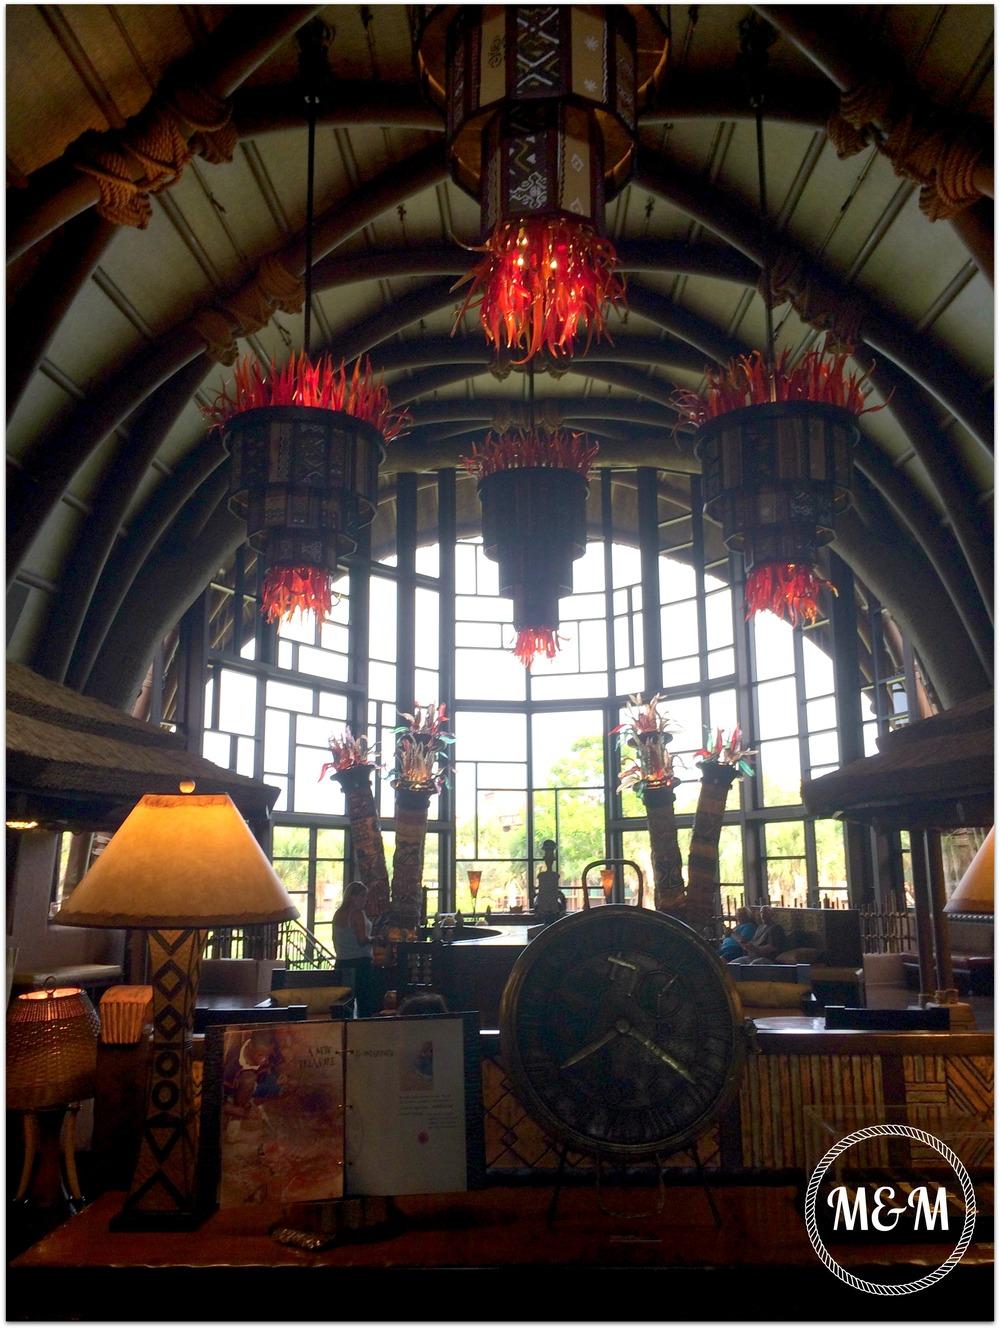 The lobby at Kidani Village, Animal Kingdom Lodge